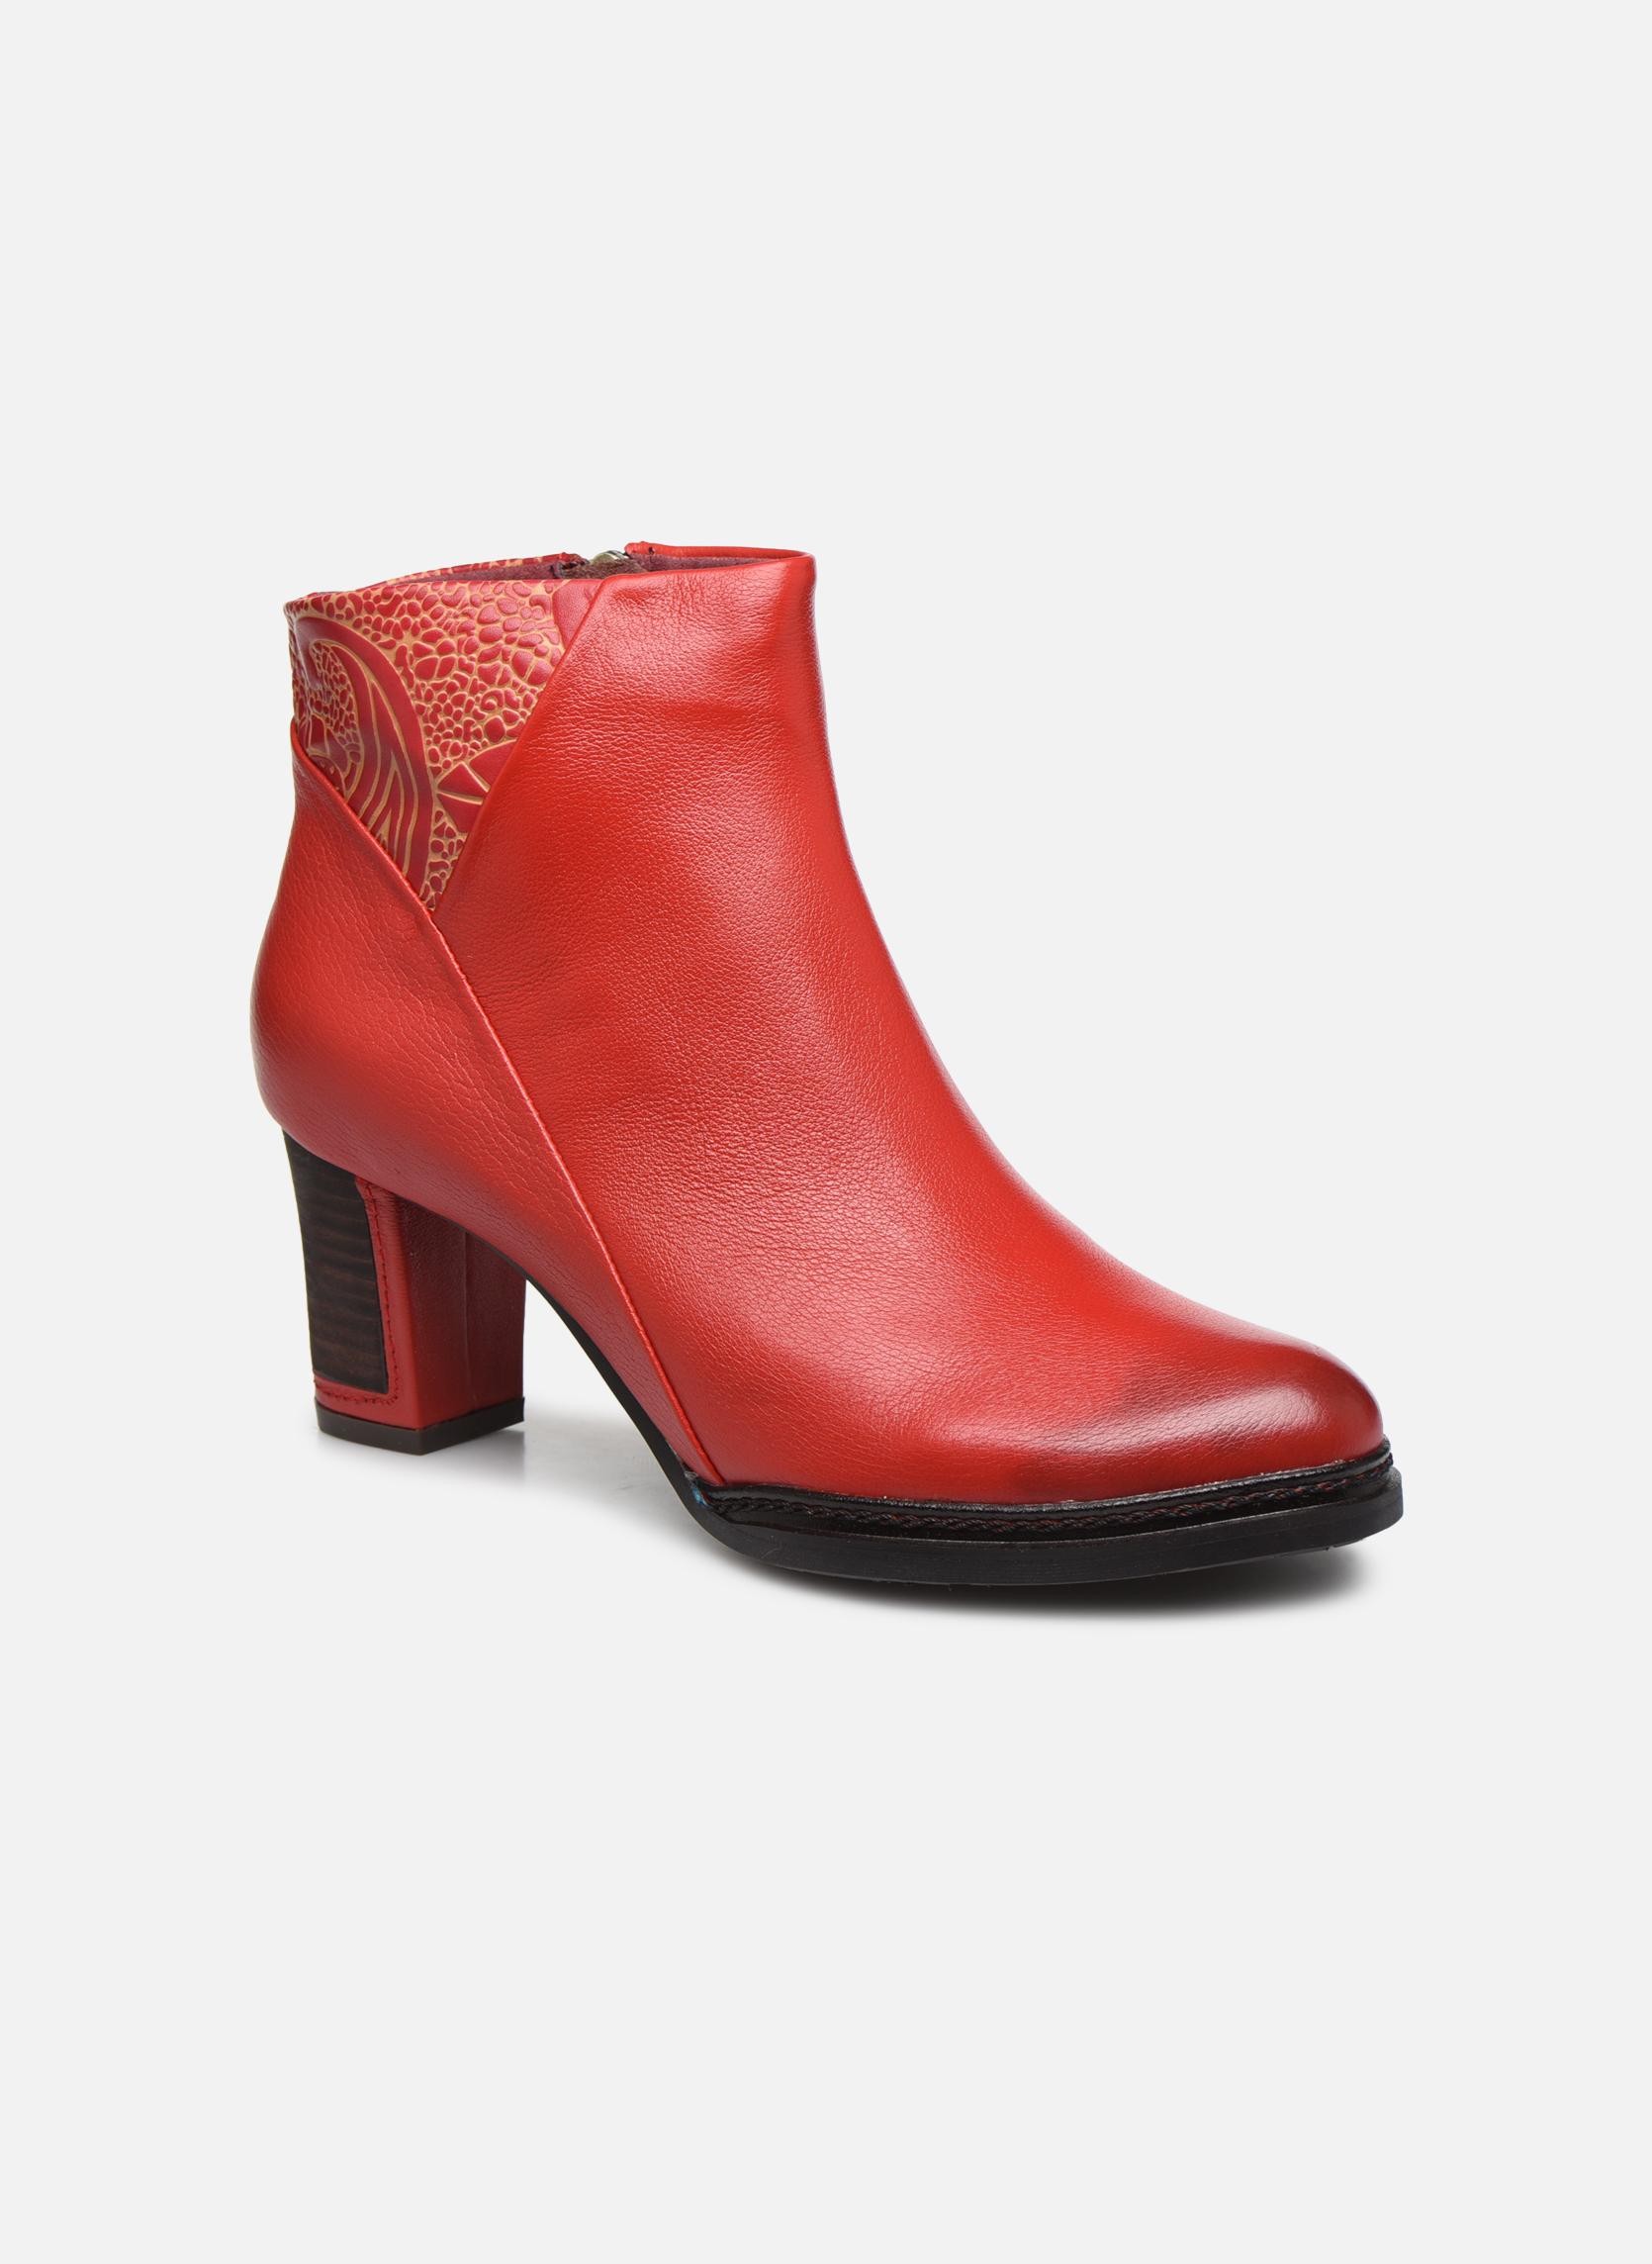 Bottines et boots Femme ANGELA 12